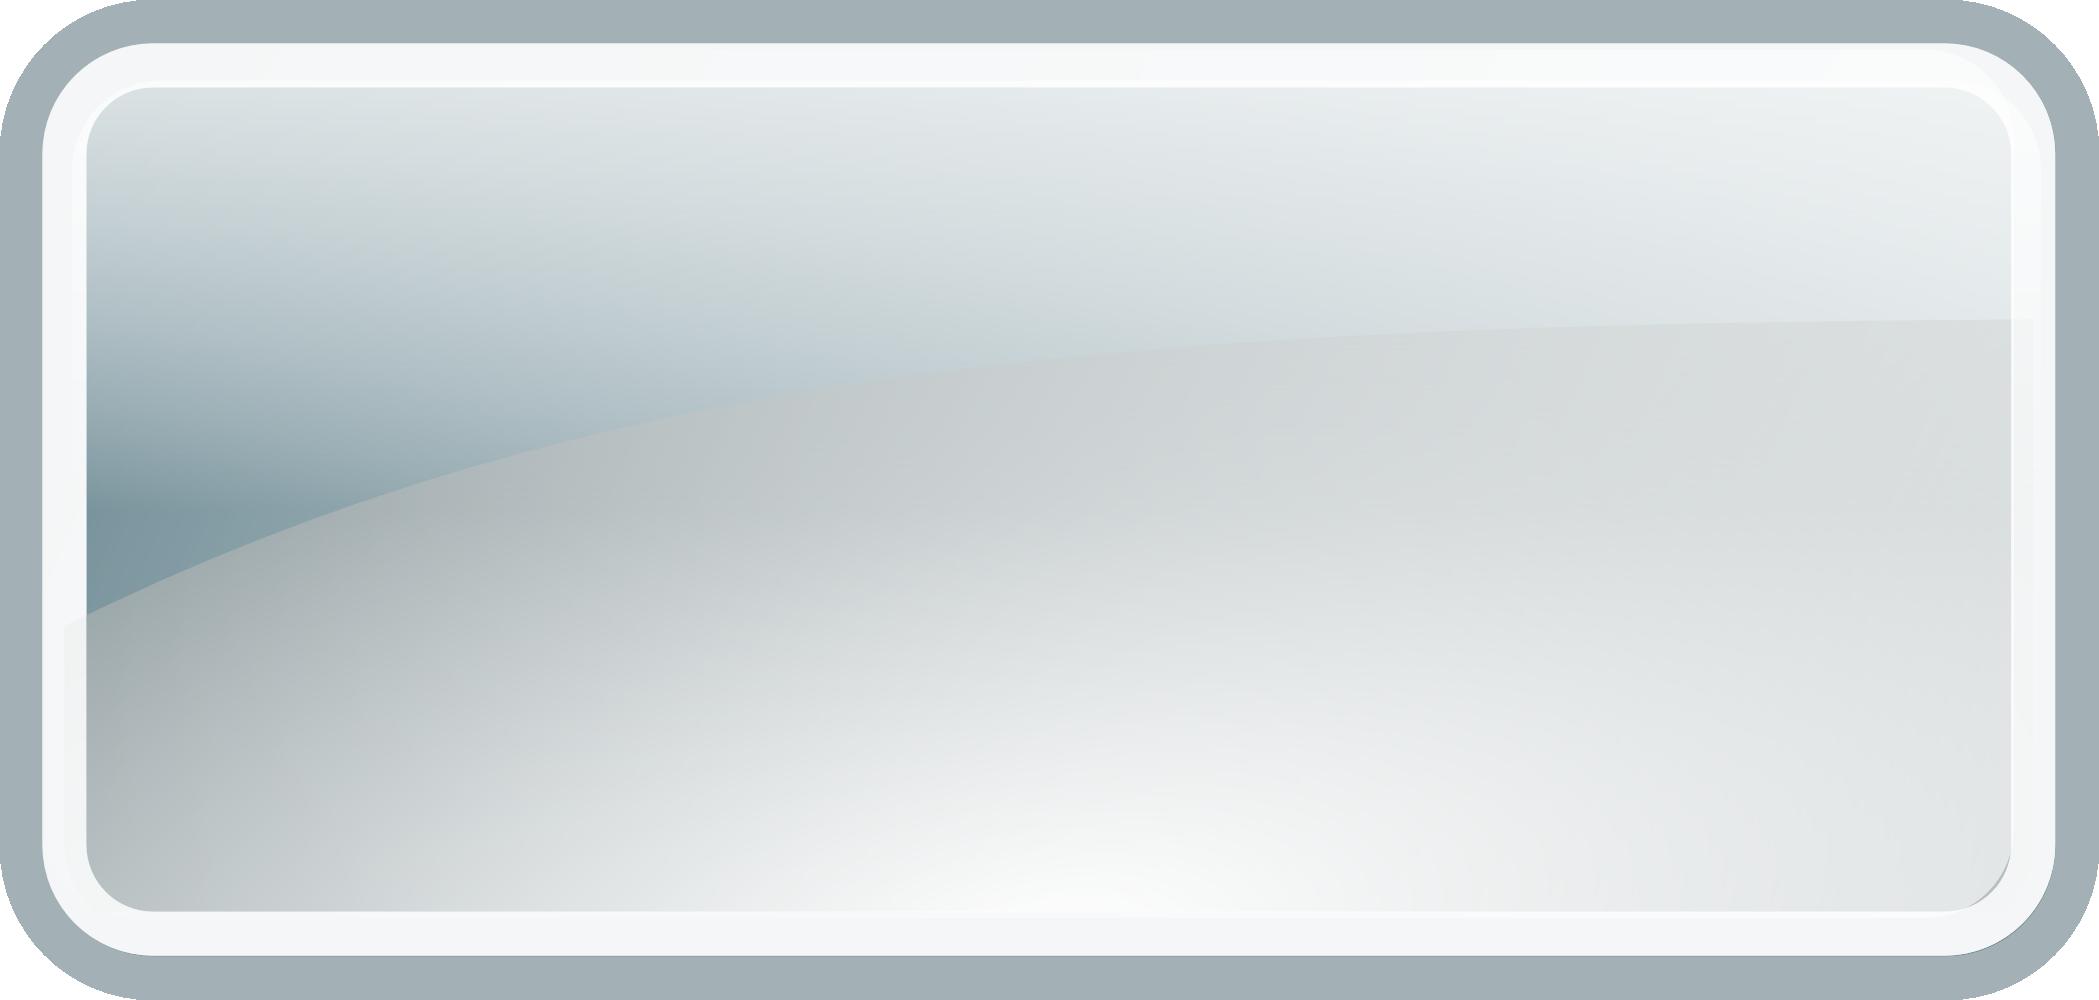 OnlineLabels Clip Art - Glossy Rectangle